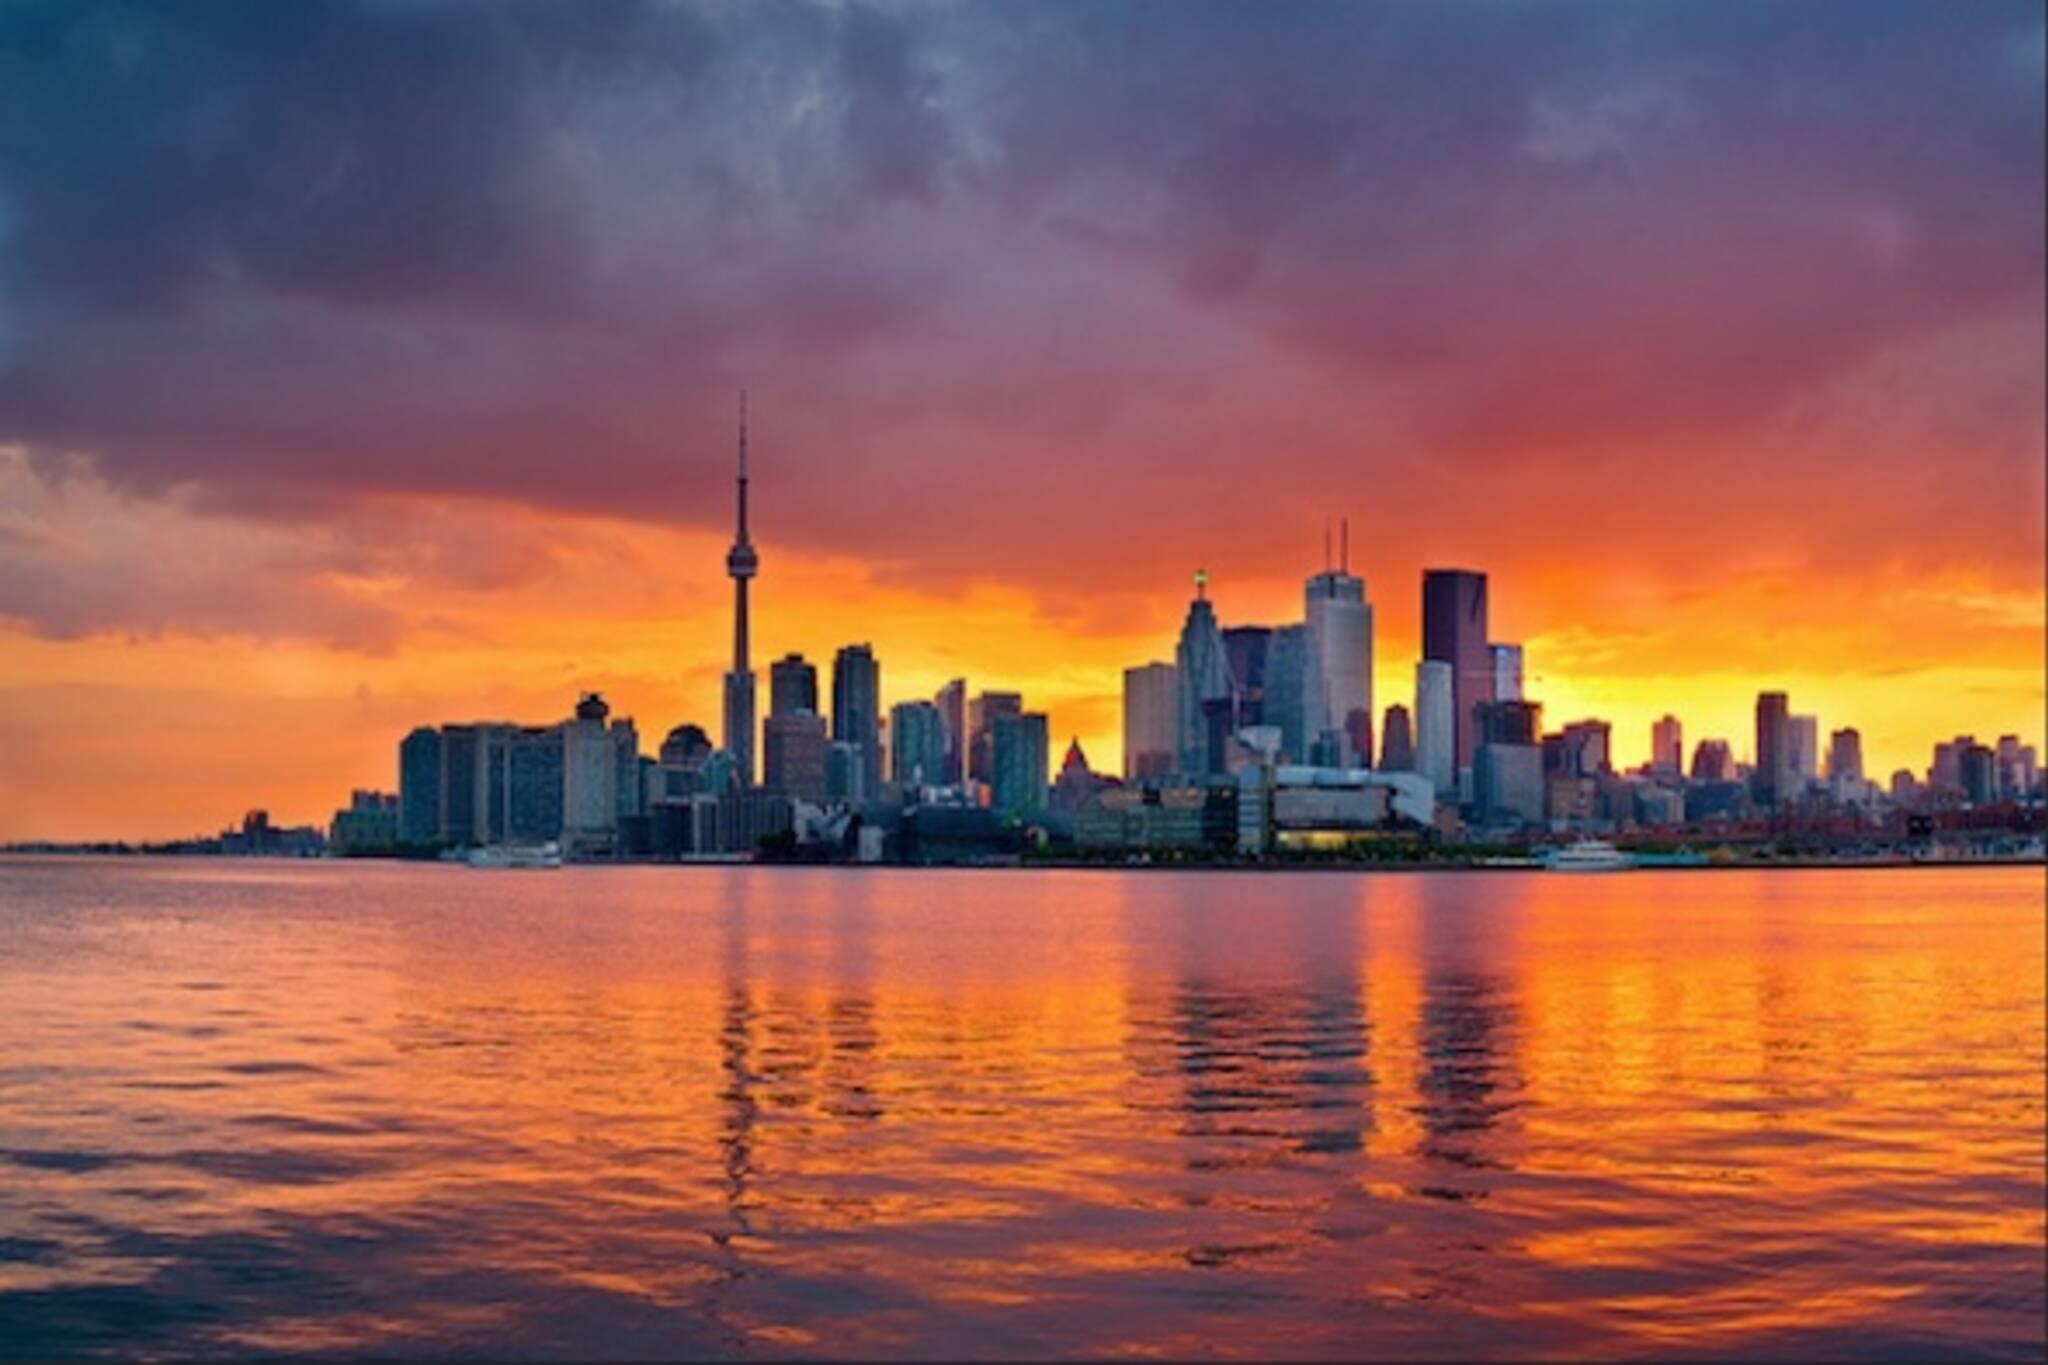 Toronto sunset polson pier